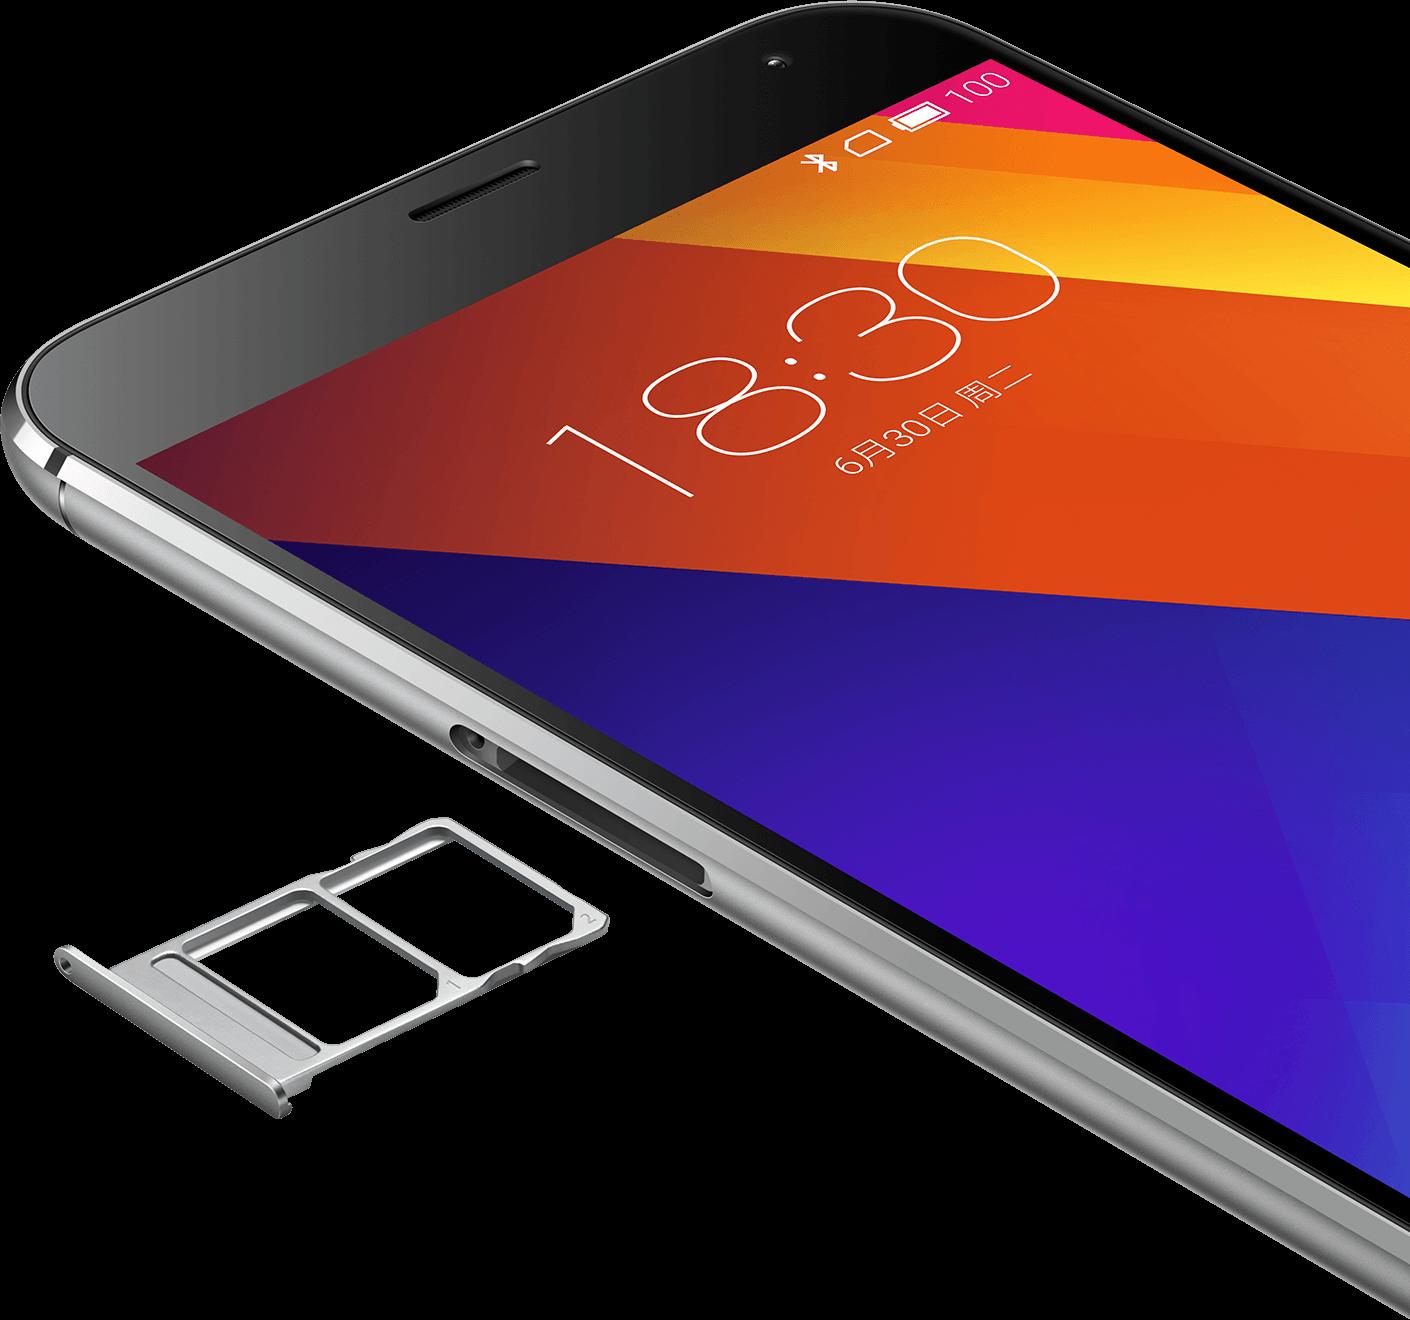 Meizu MX5, Angebot, günstig, High End, Smartphone China, China Handy, bester Preis, zollfrei, Flyme OS , OTA Meizu Flyme, Test Testbericht